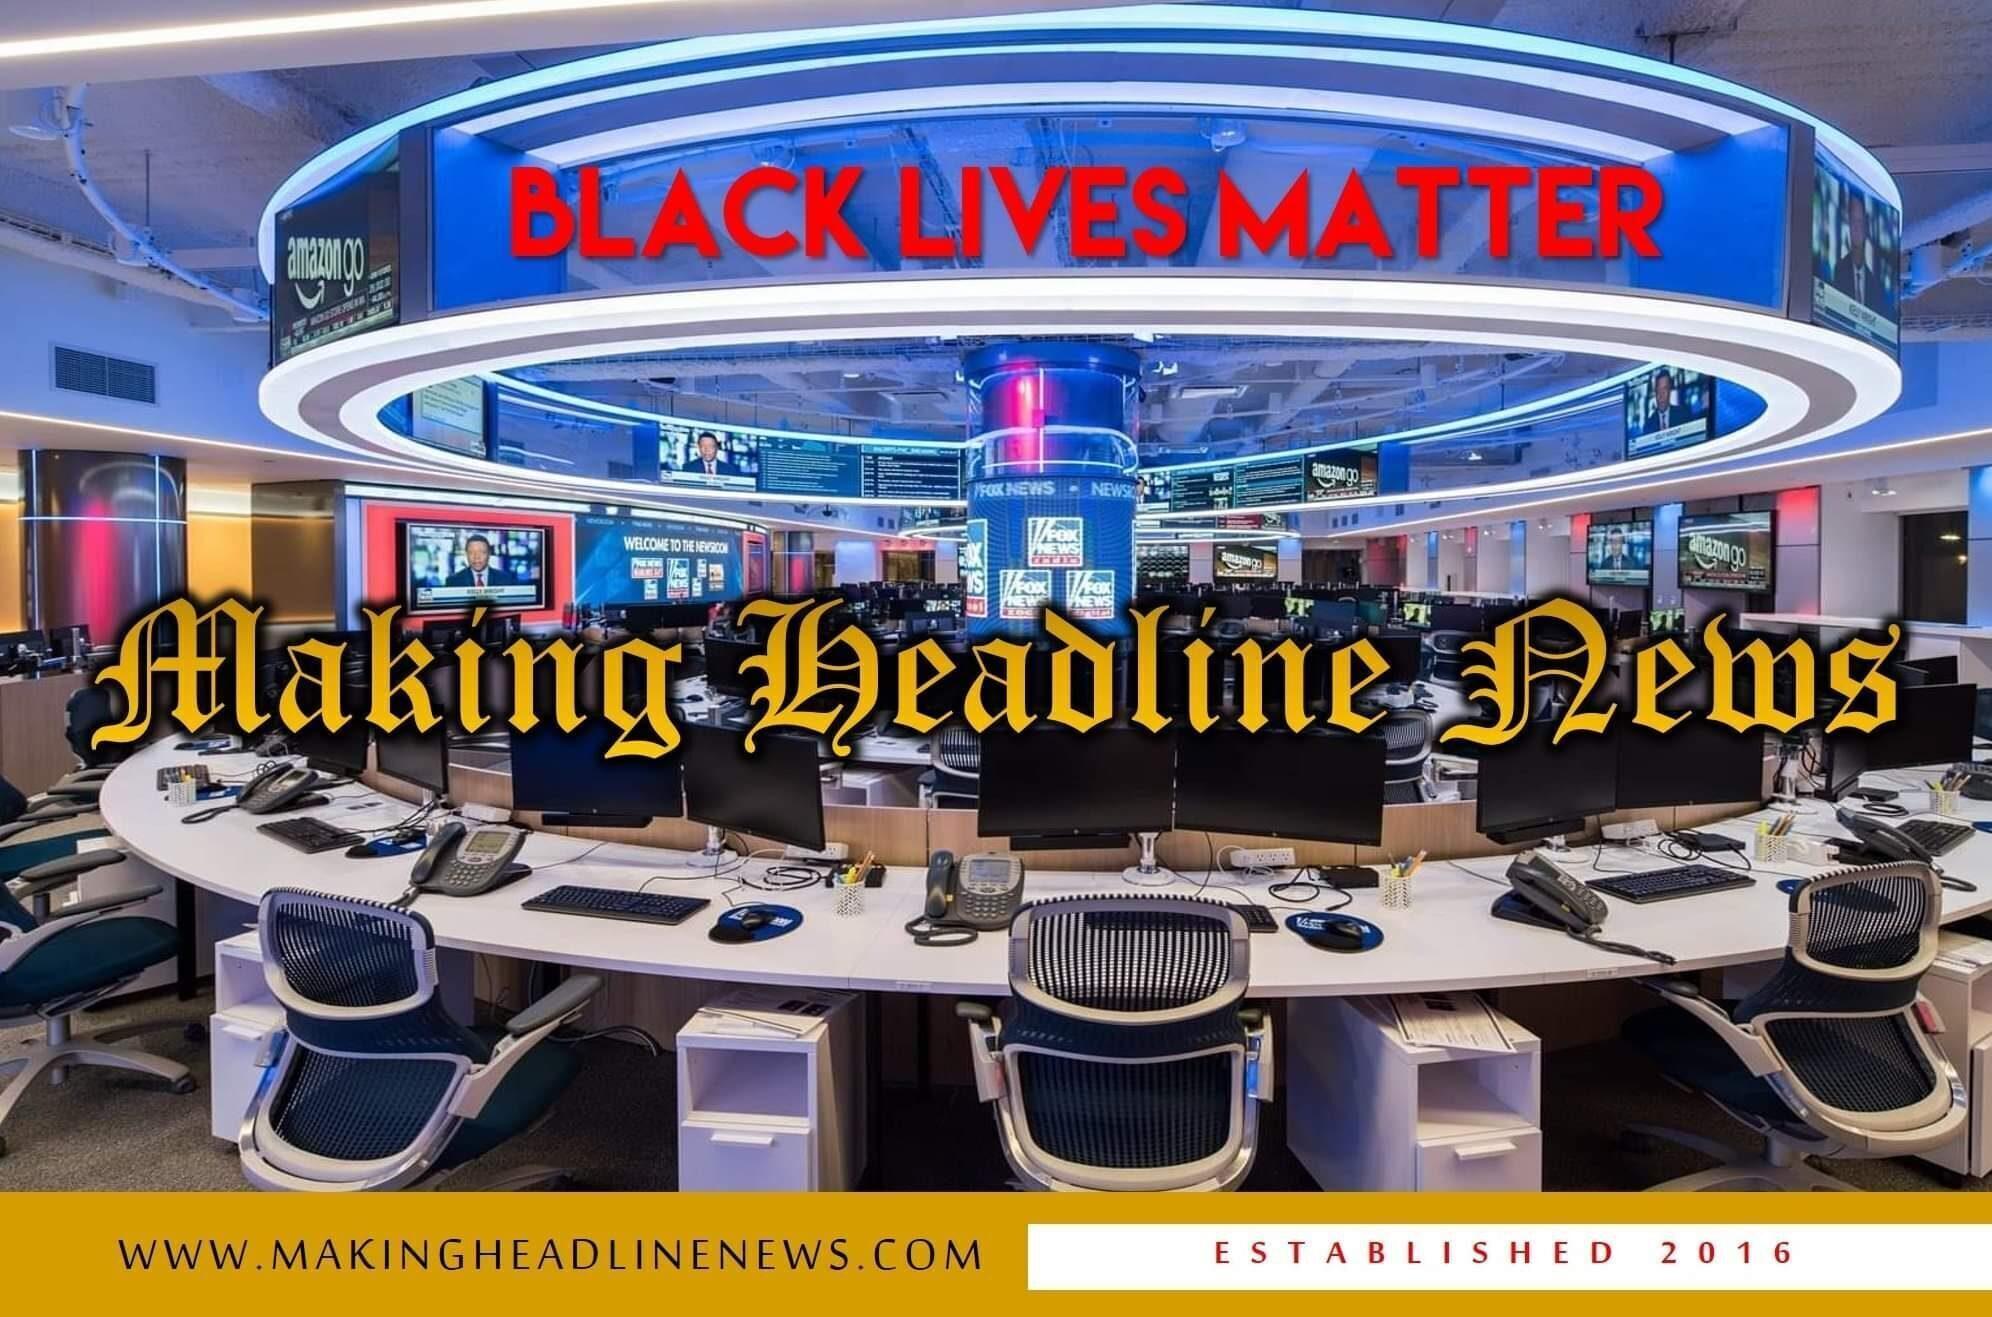 Making Headline News